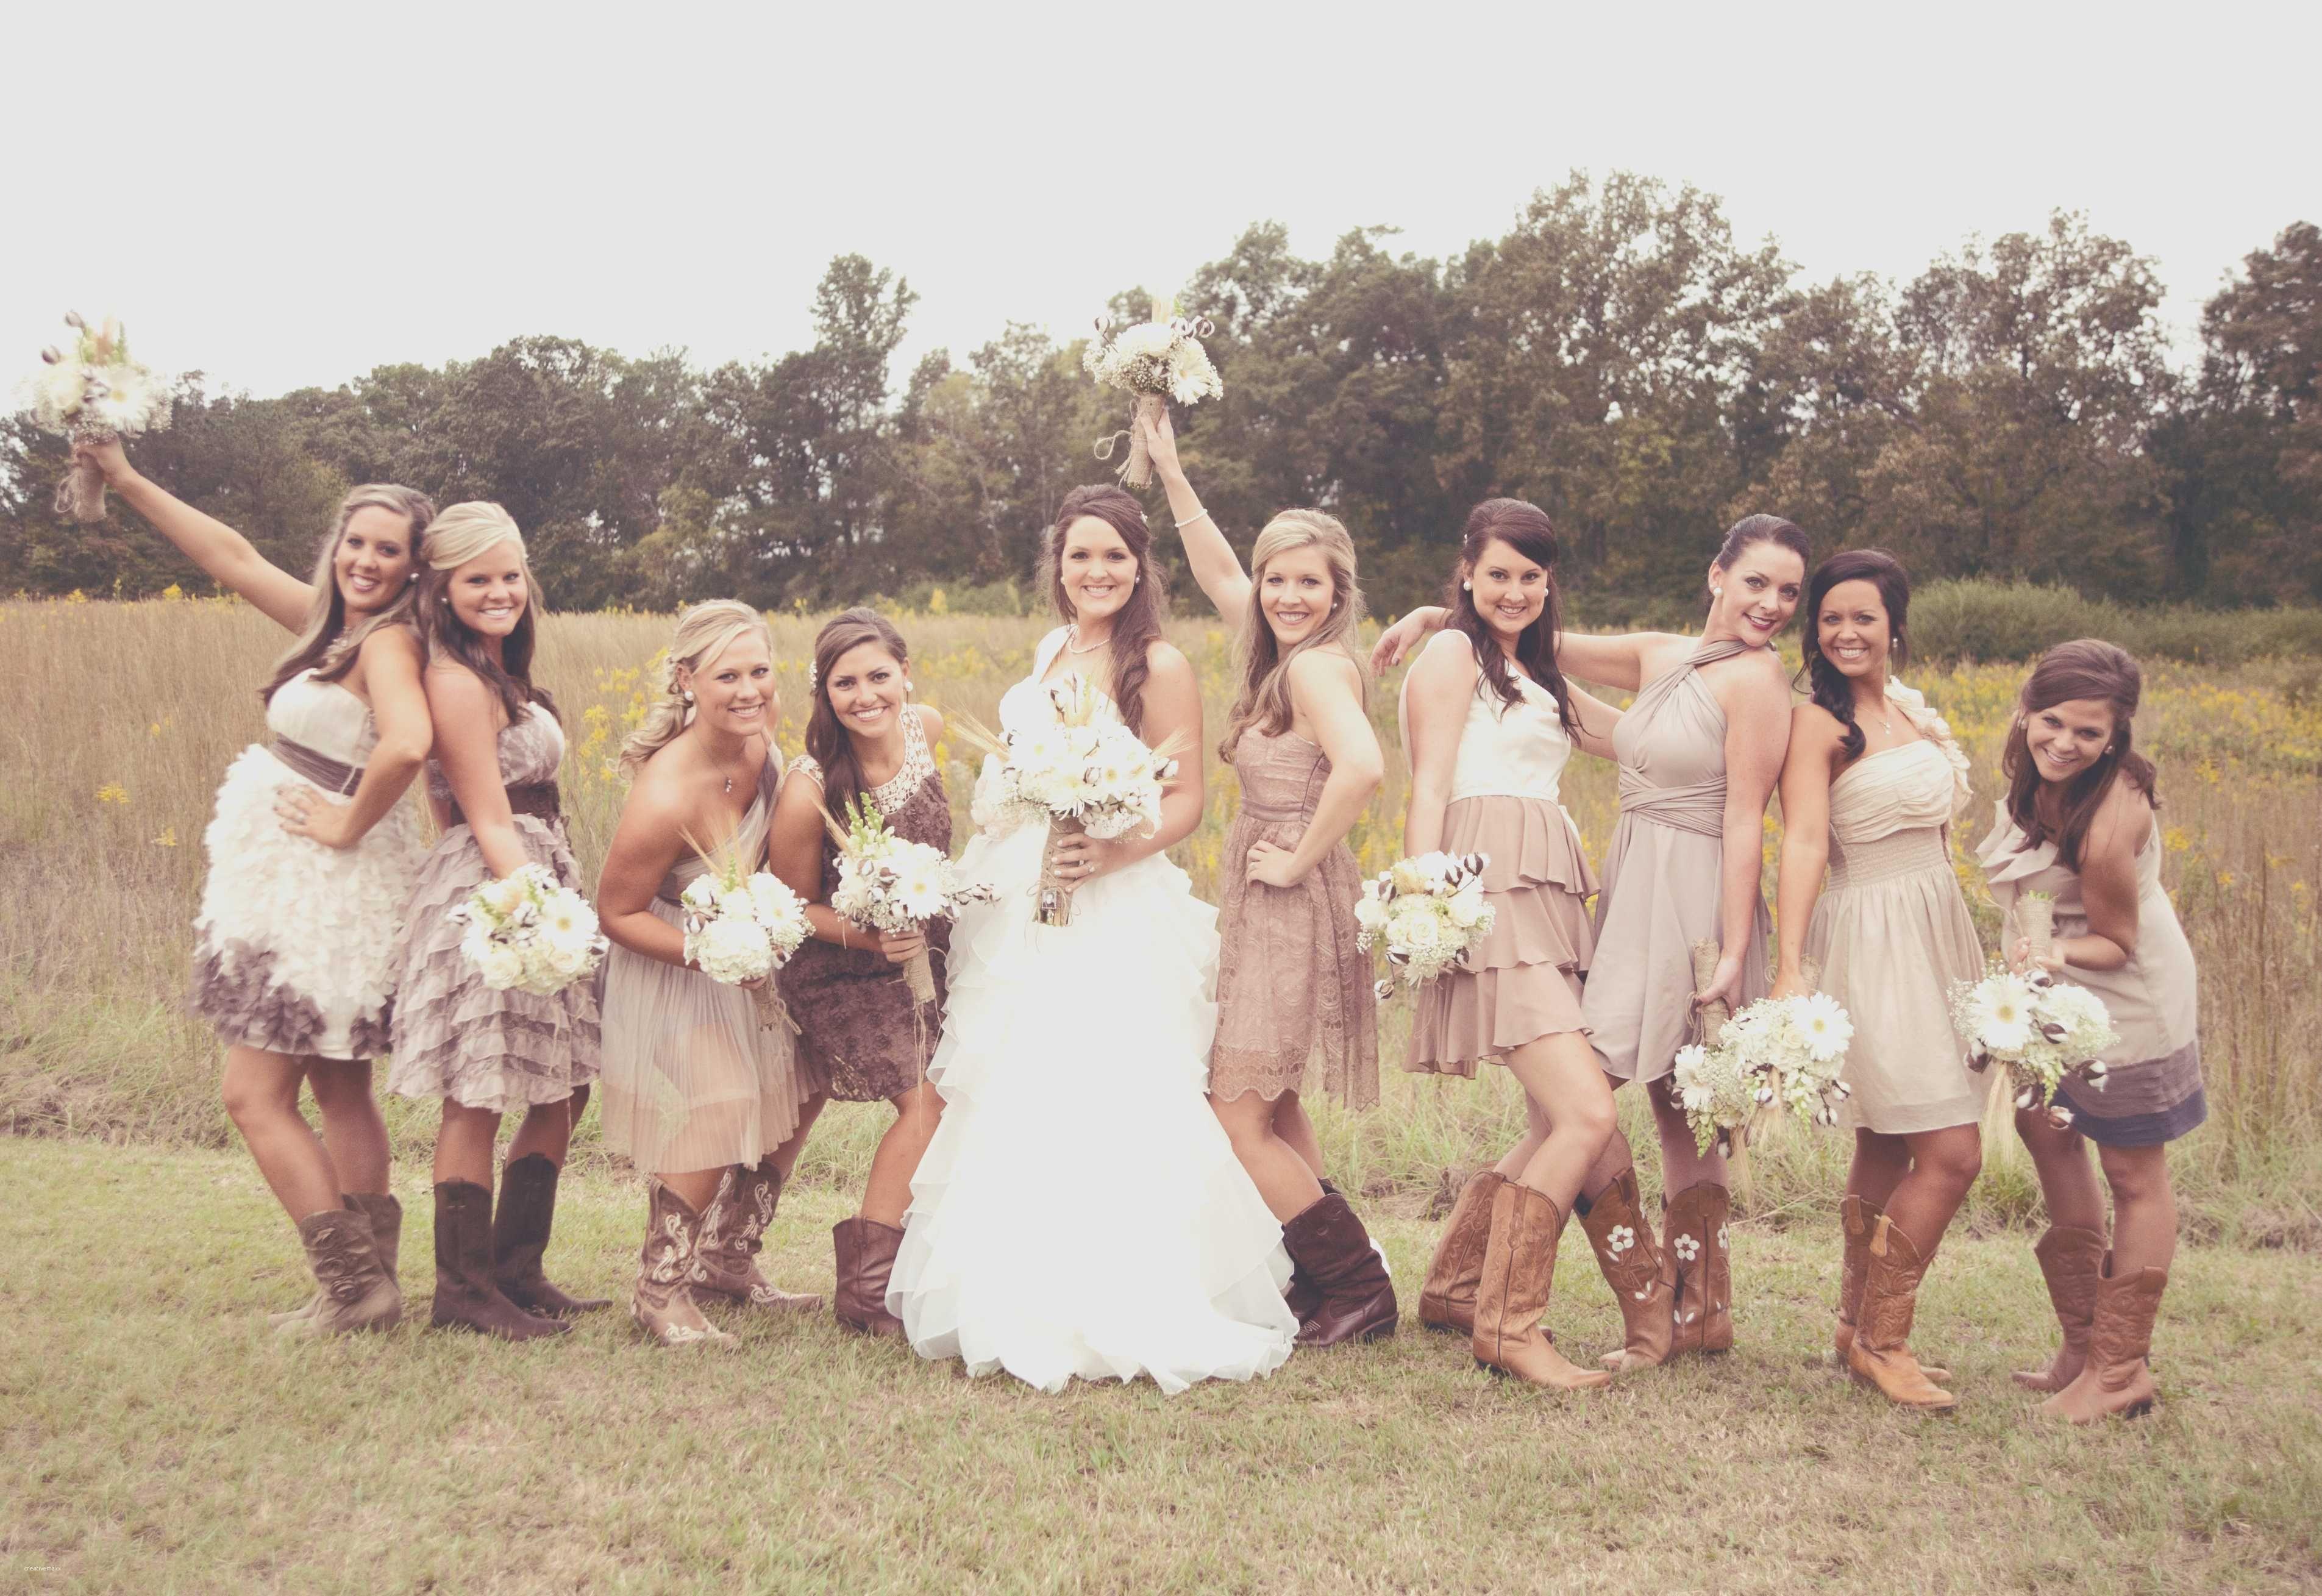 Groomsmen Attire Tan Champagne Bridesmaid Dresses Elegant Groomsmen Attire Tan Champ Country Wedding Bridesmaids Rustic Bridesmaid Dresses Rustic Bridesmaids [ 2618 x 3809 Pixel ]